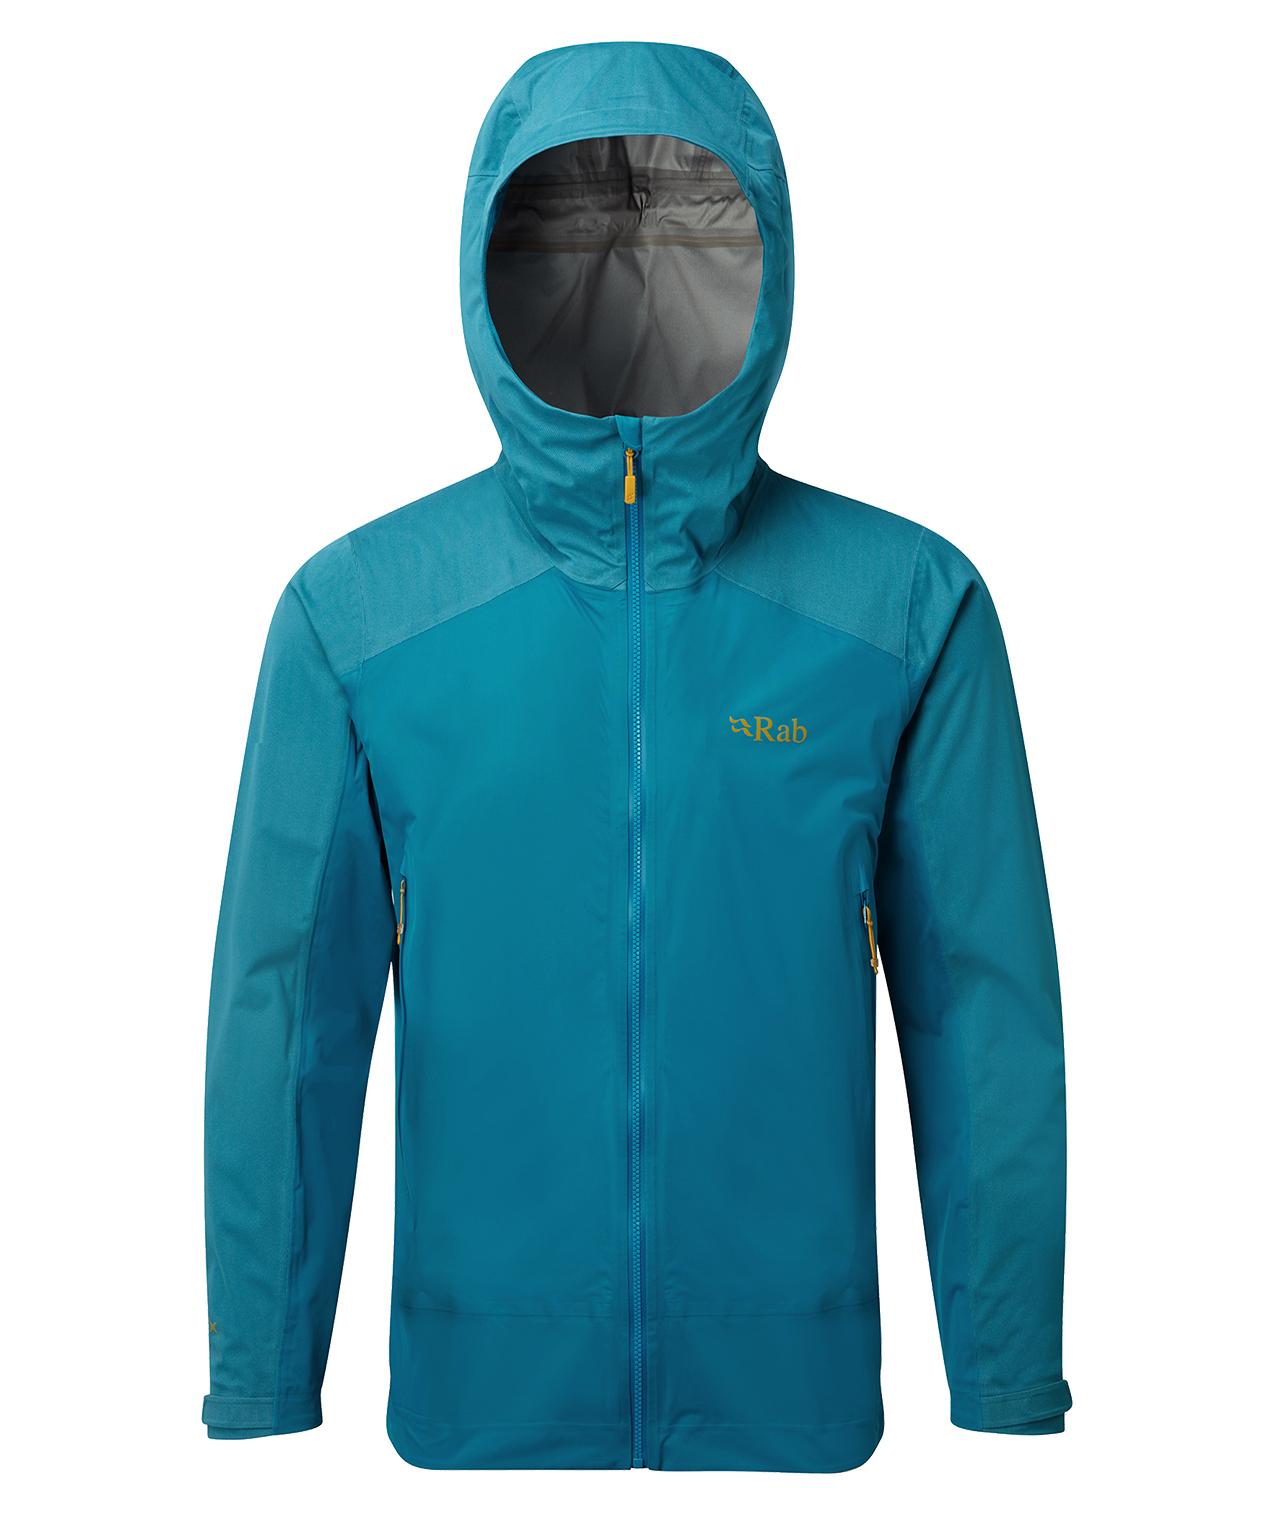 Rab Mens Kinetic Alpine Jacket Azure - £89.25 with code at Trekitt